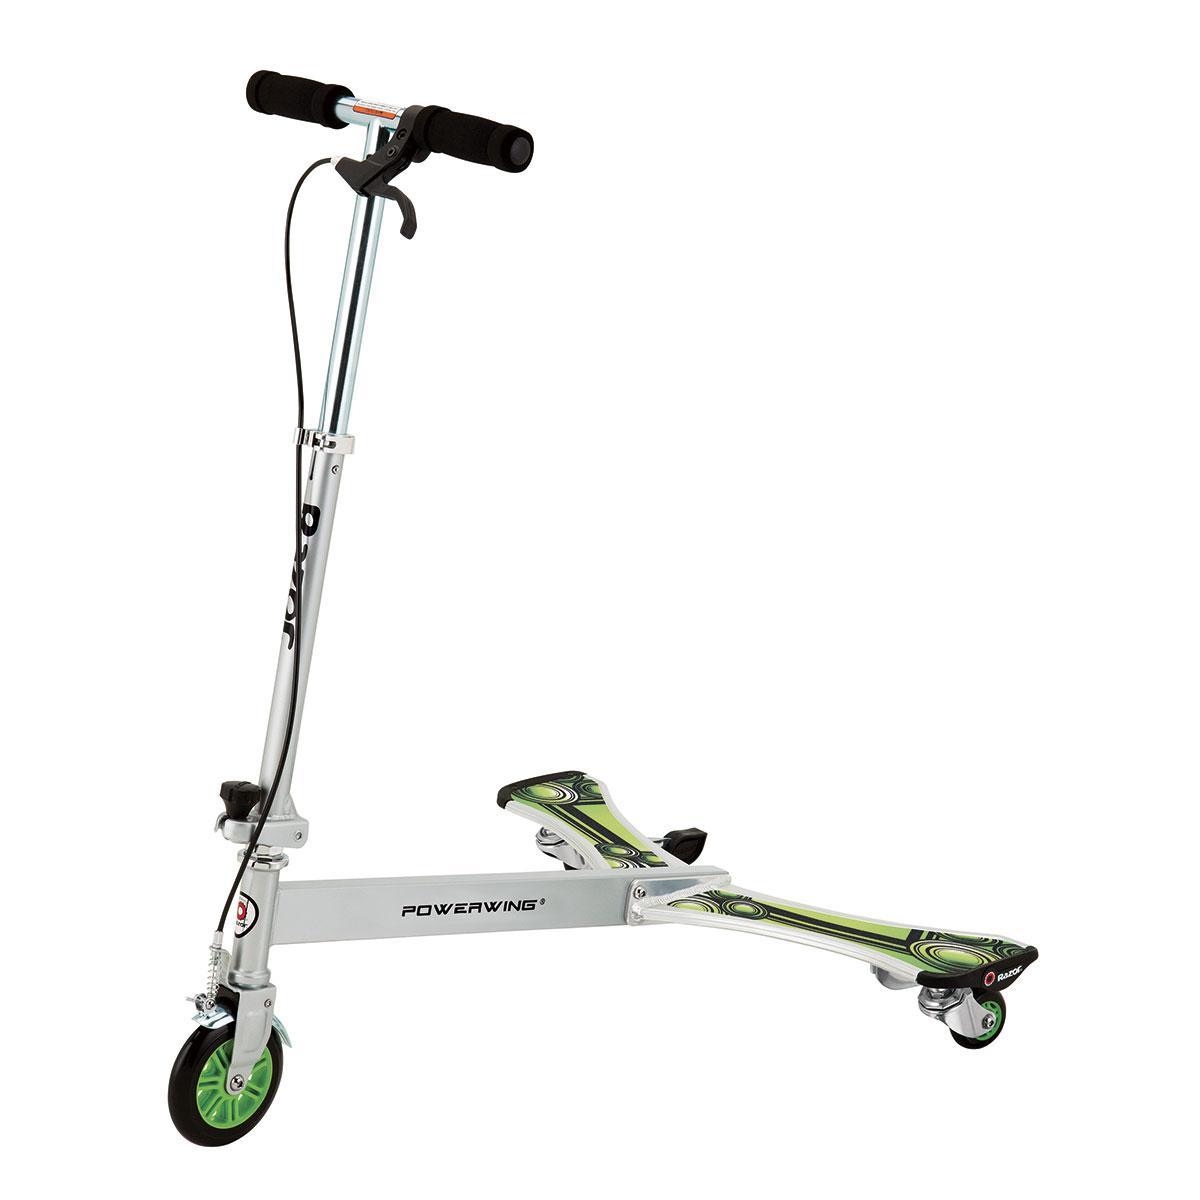 Image of   Razor trehjulede løbehjul - Powerwing DLX - Hvid/grøn